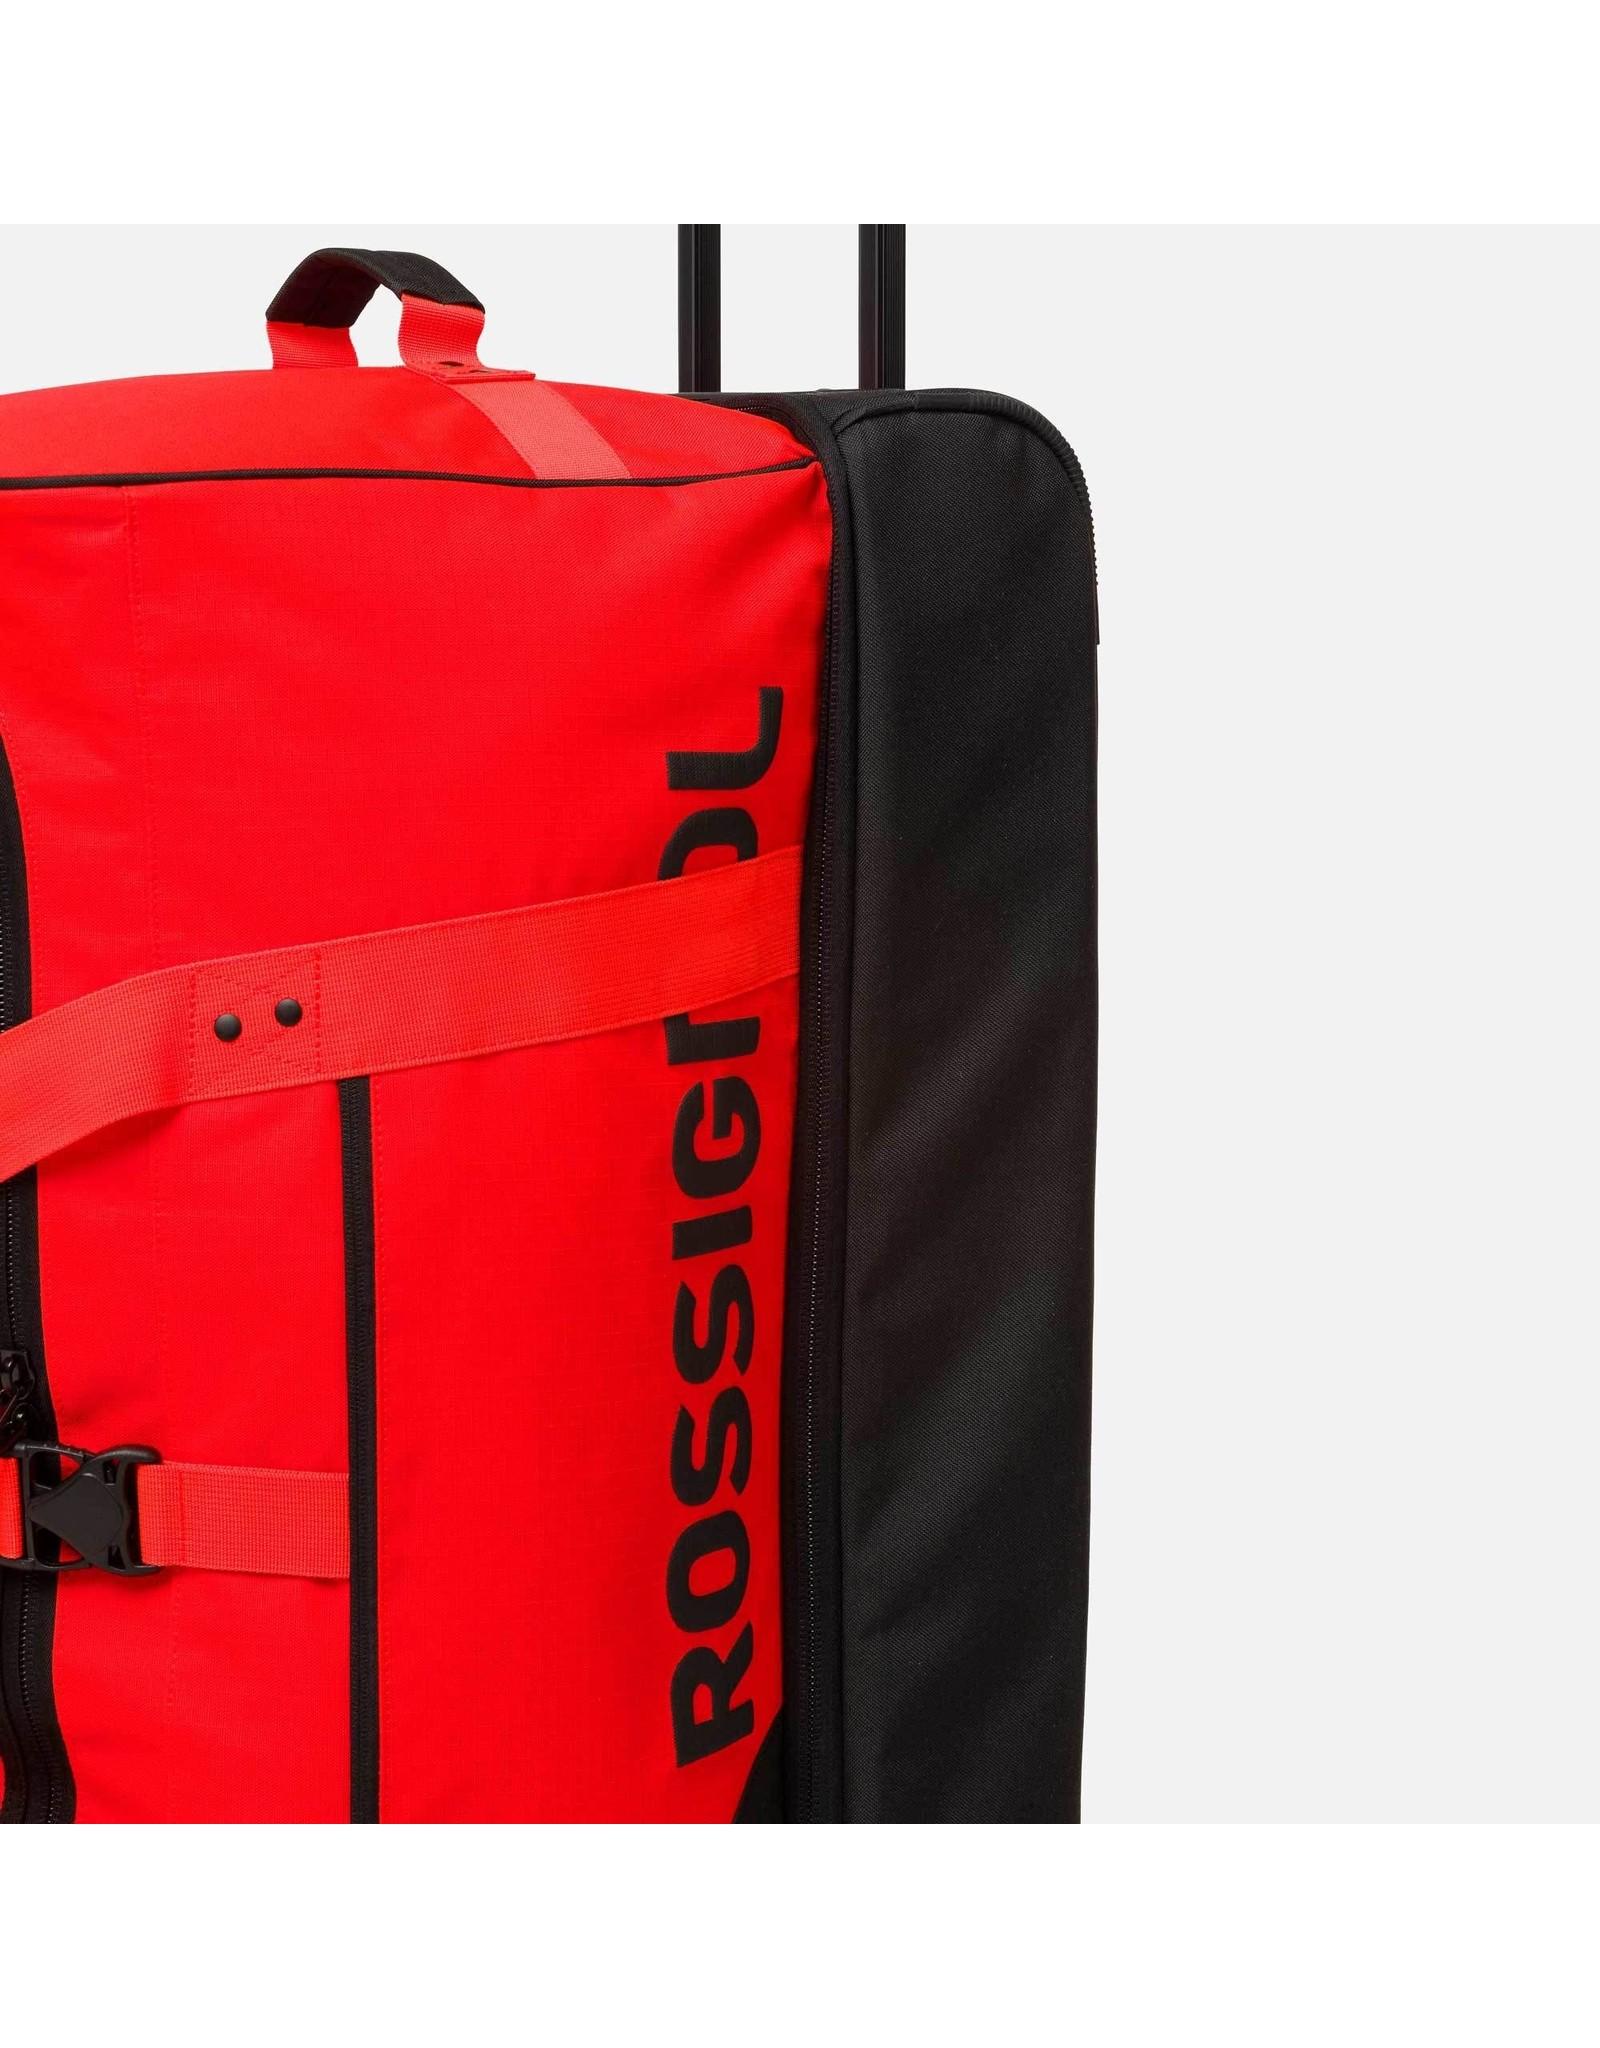 ROSSIGNOL ROSSIGNOL HERO EXPLORER BAG 20